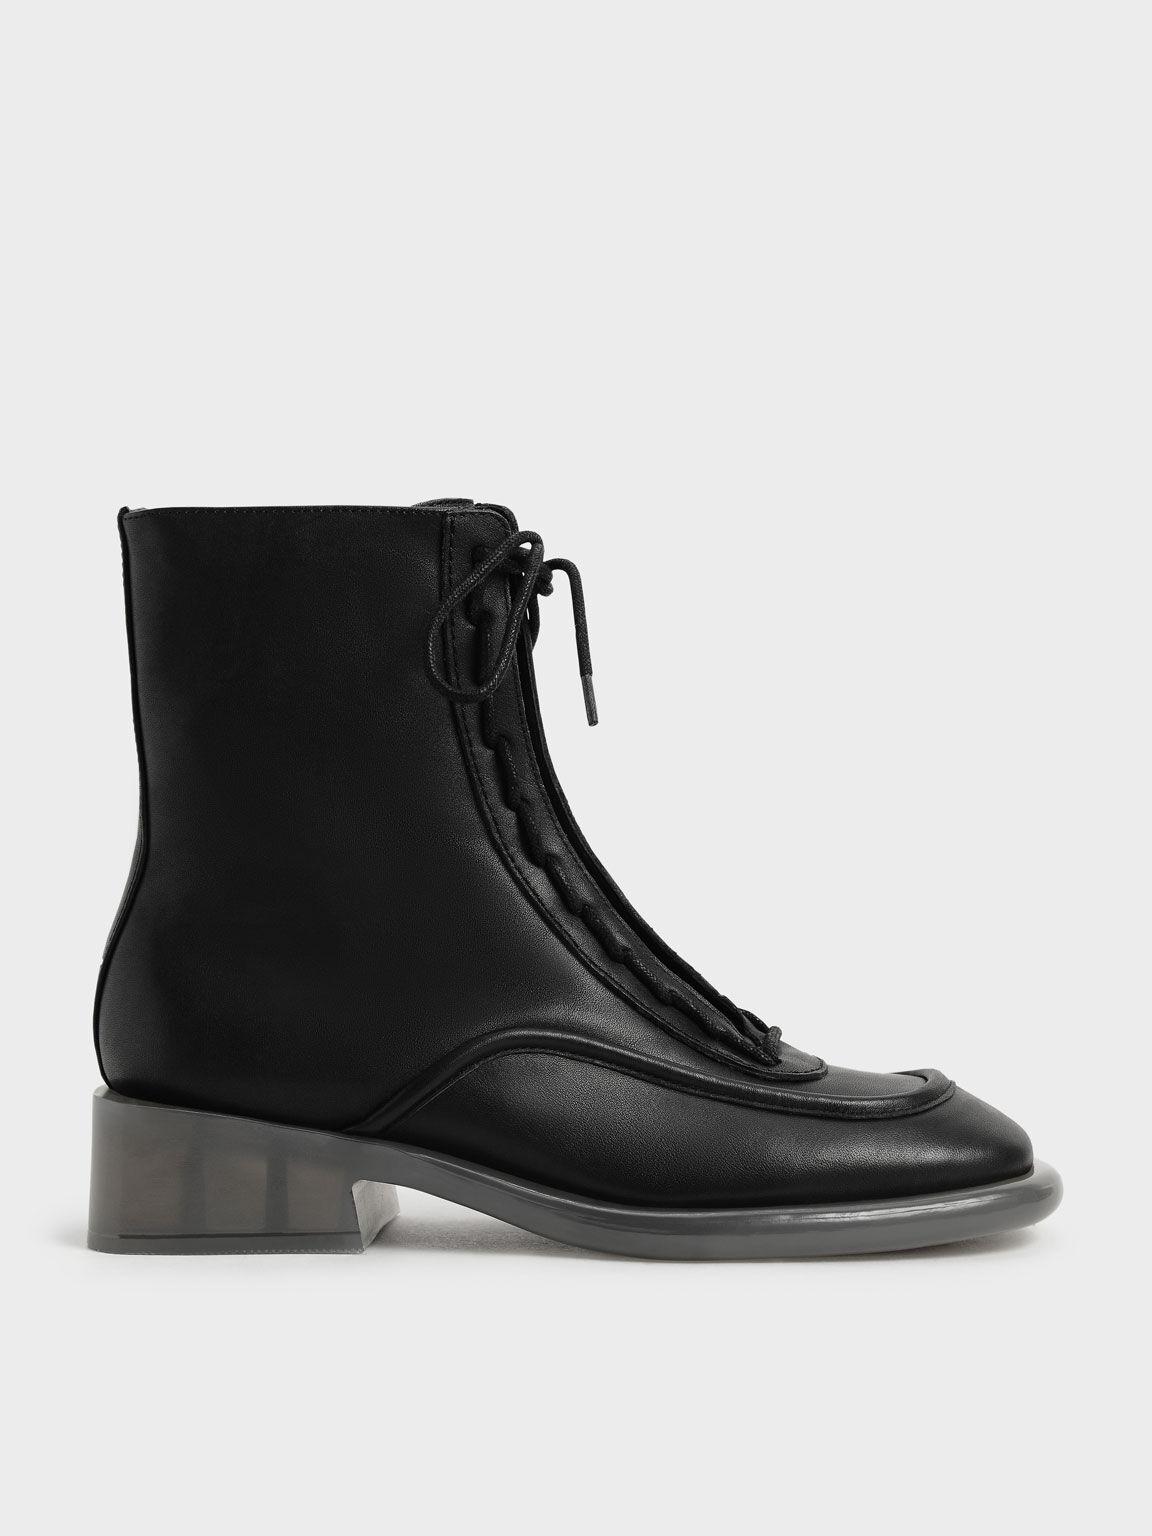 Fleur真皮厚底拉鍊靴, 黑色, hi-res